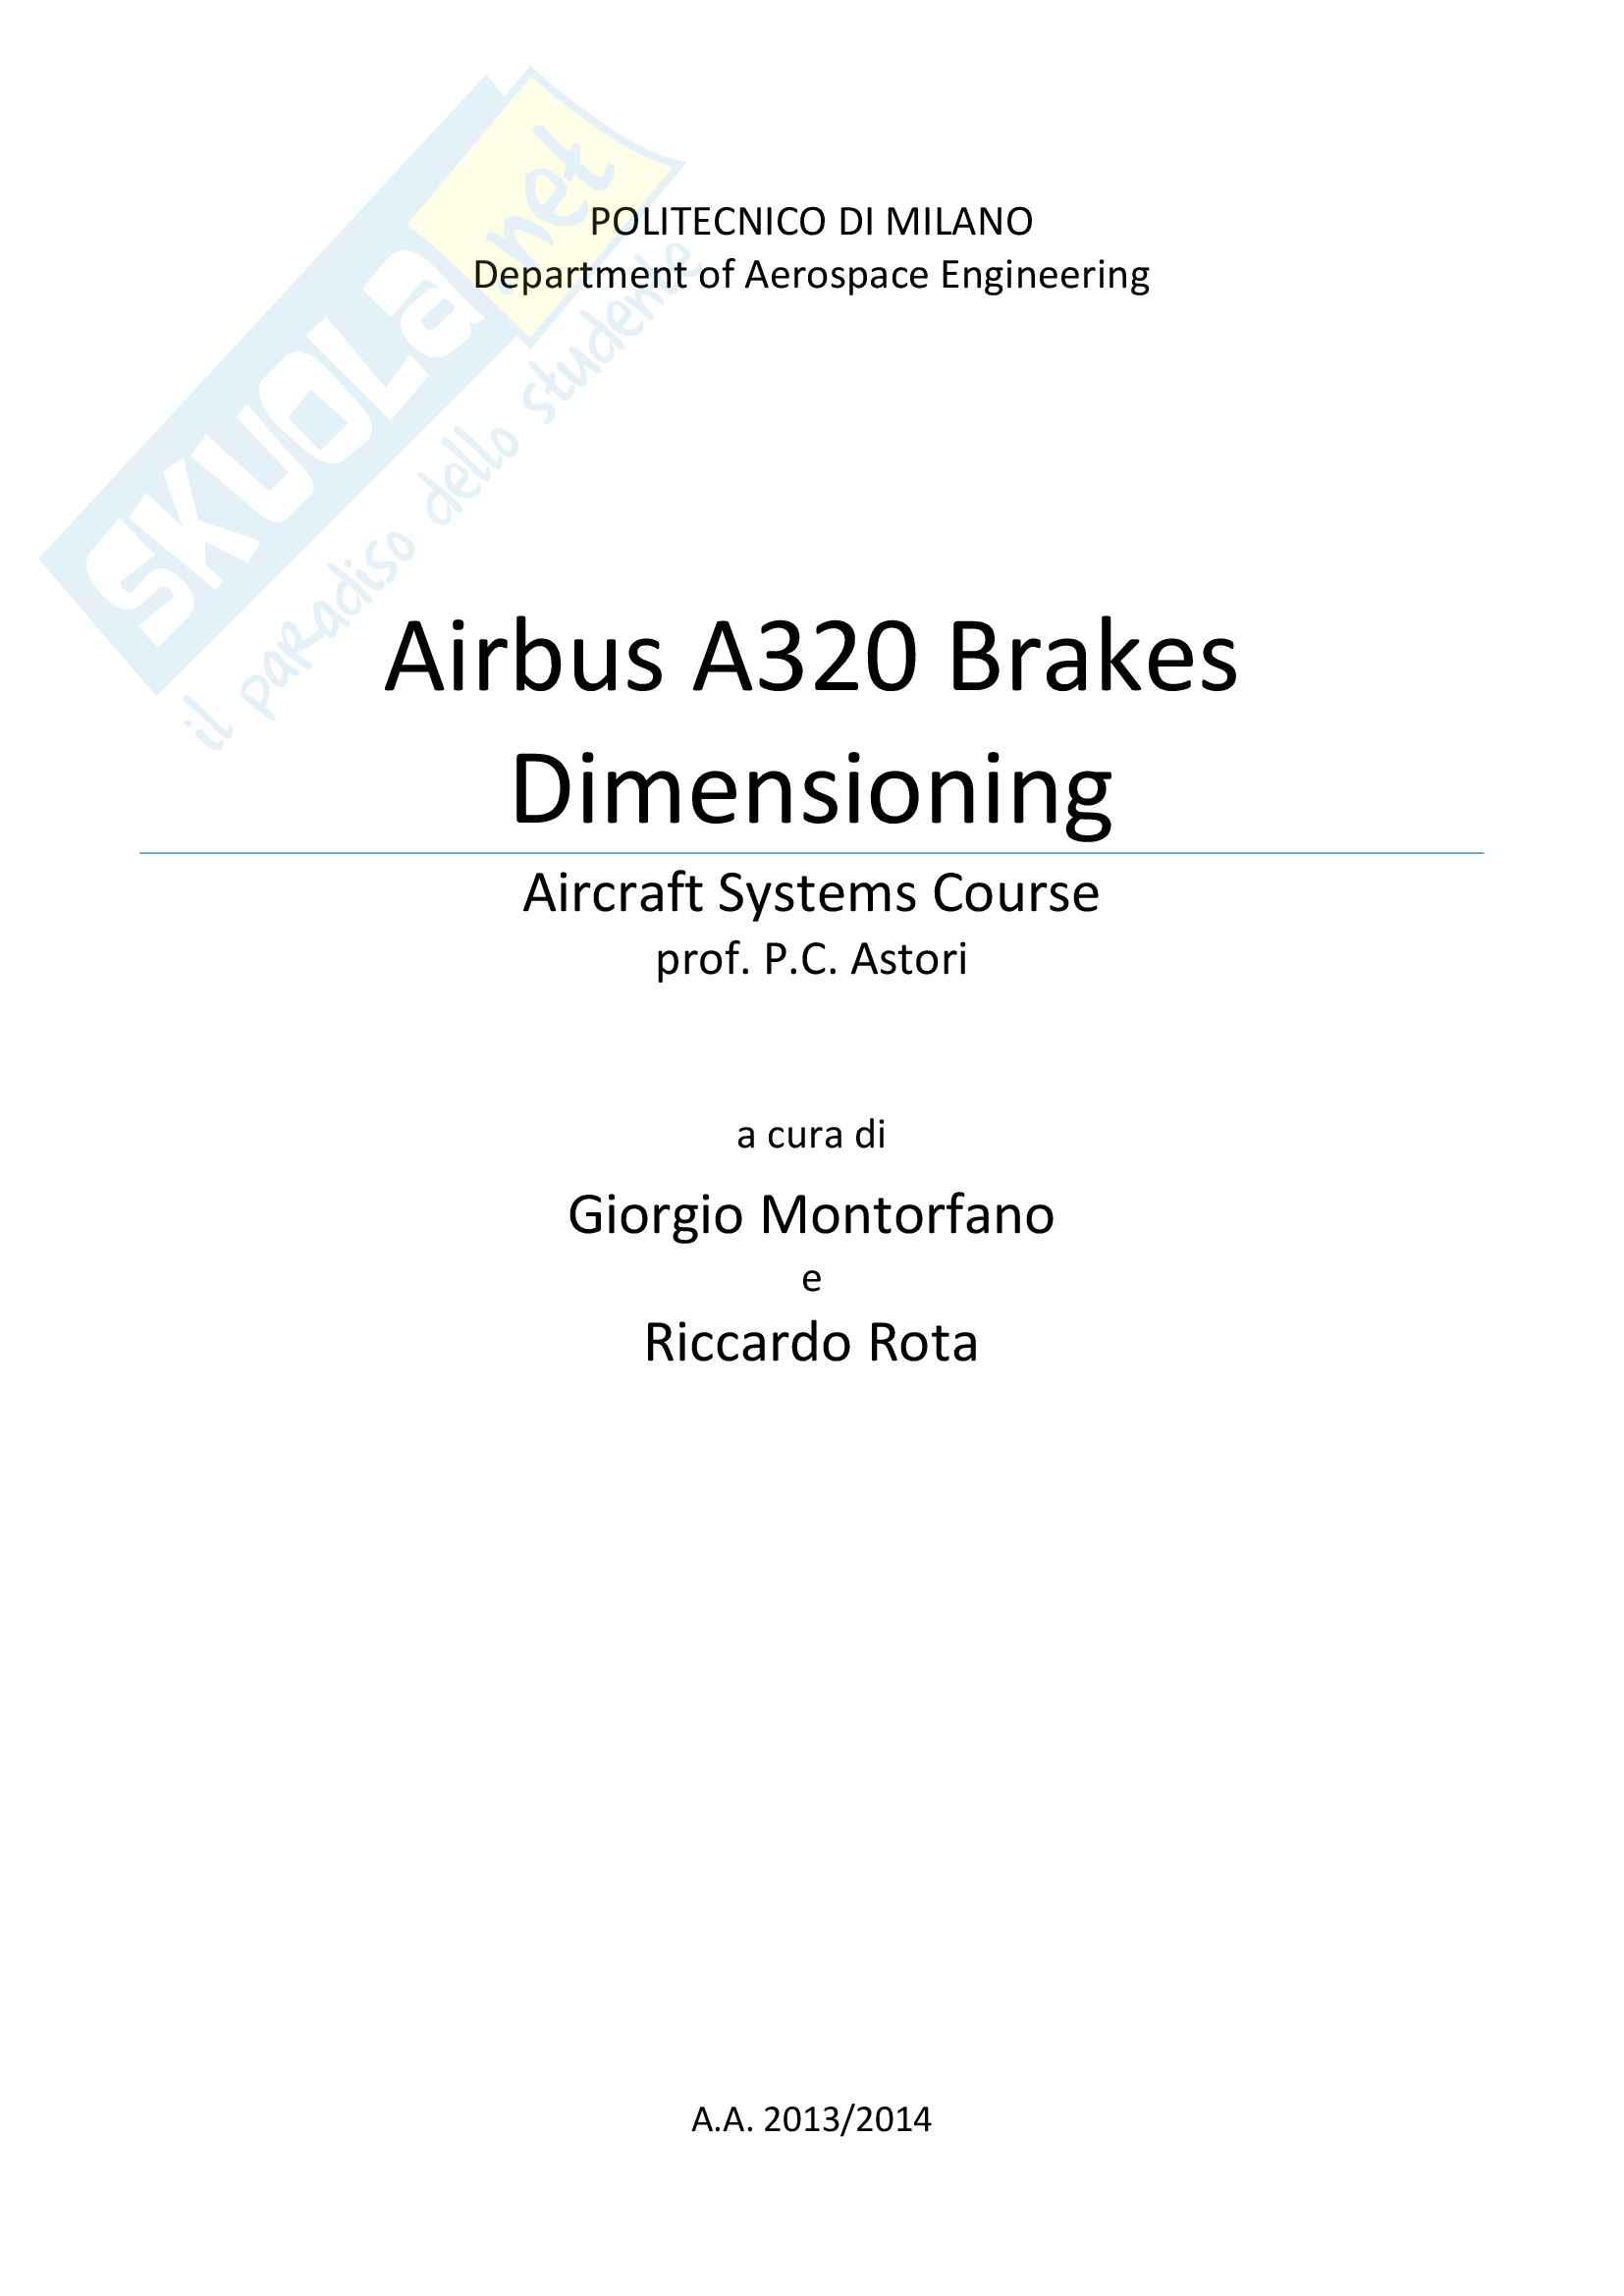 Airbus A320 Brakes Dimensioning